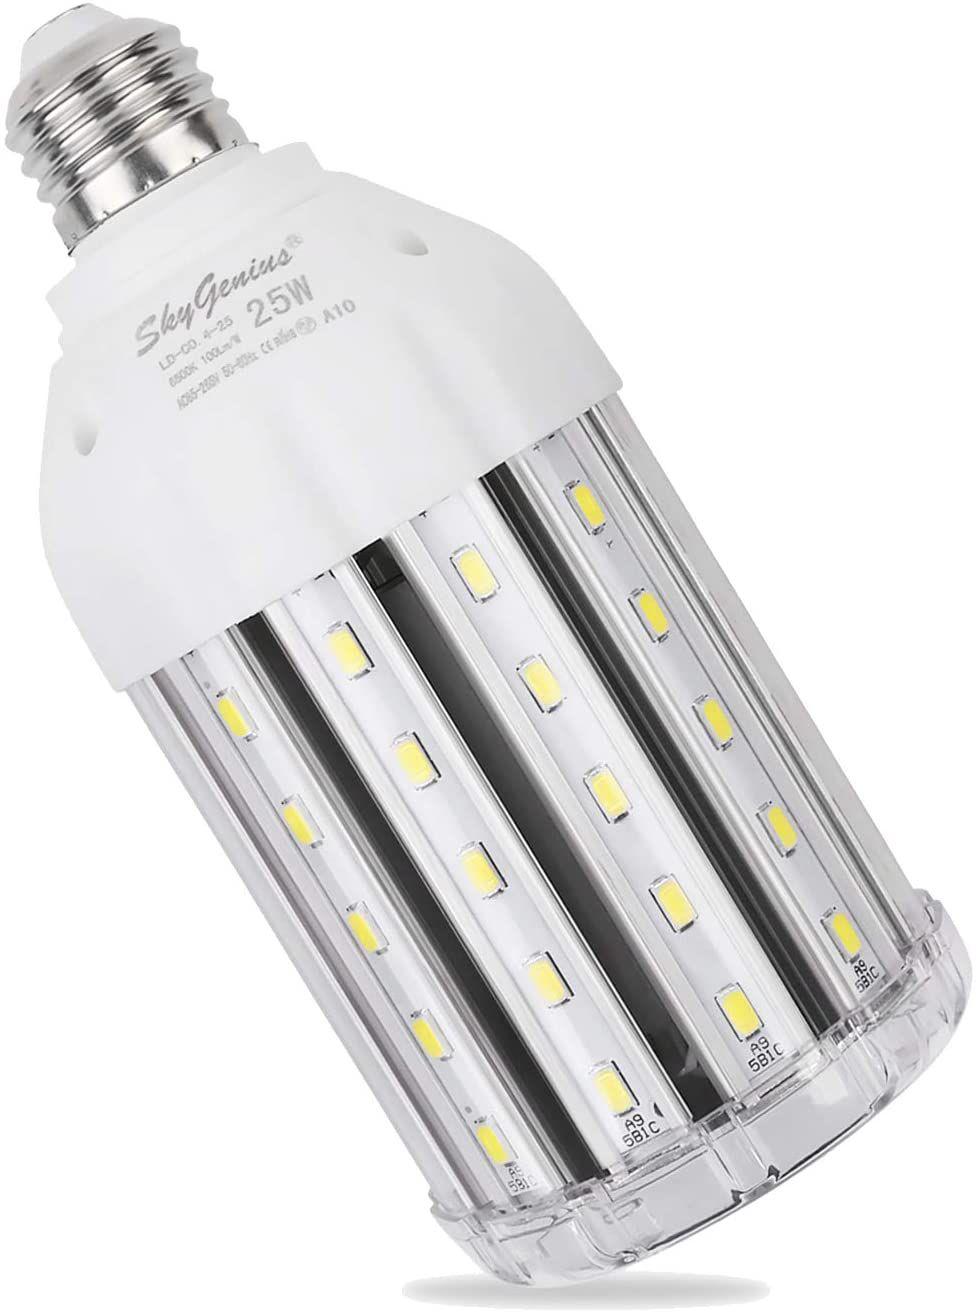 Daylight LED Corn Light Bulb